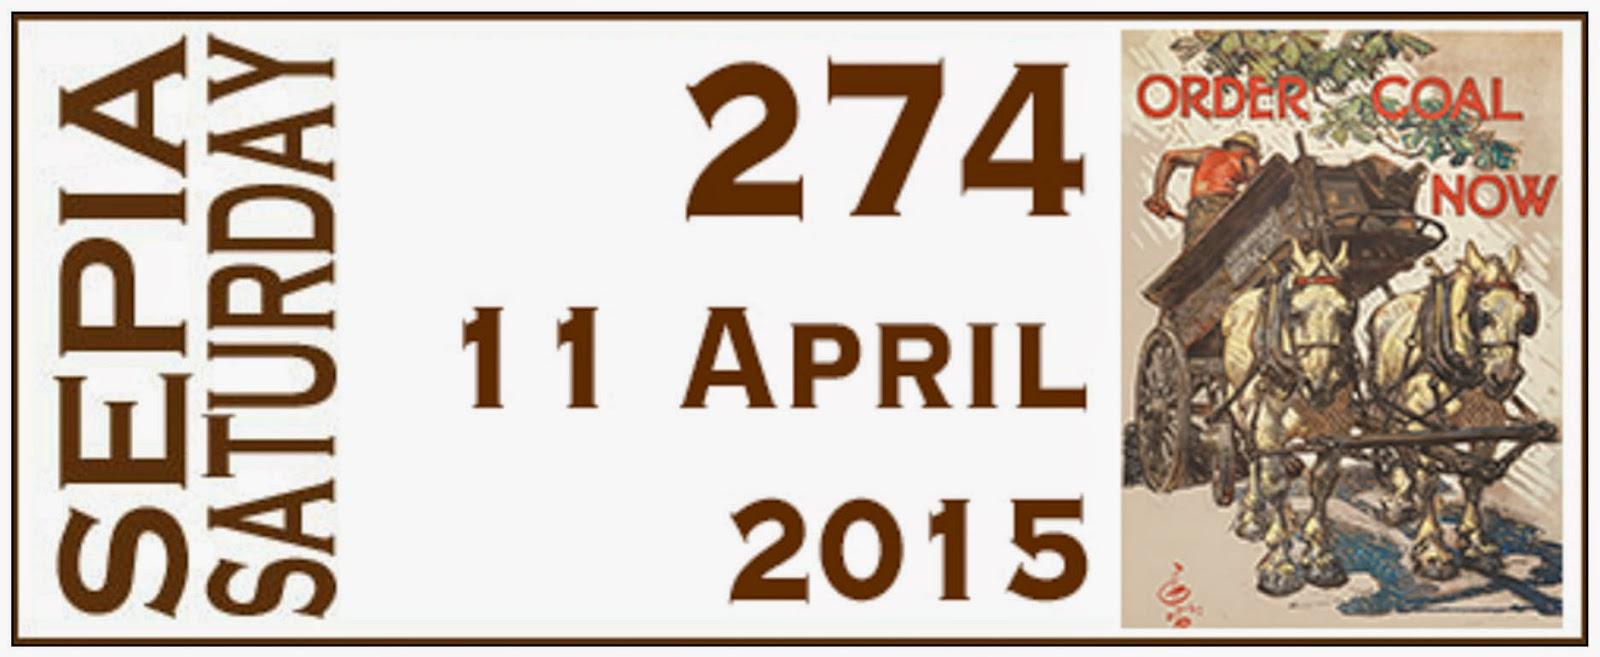 http://sepiasaturday.blogspot.com/2015/04/sepia-saturday-274-11-april-2015.html